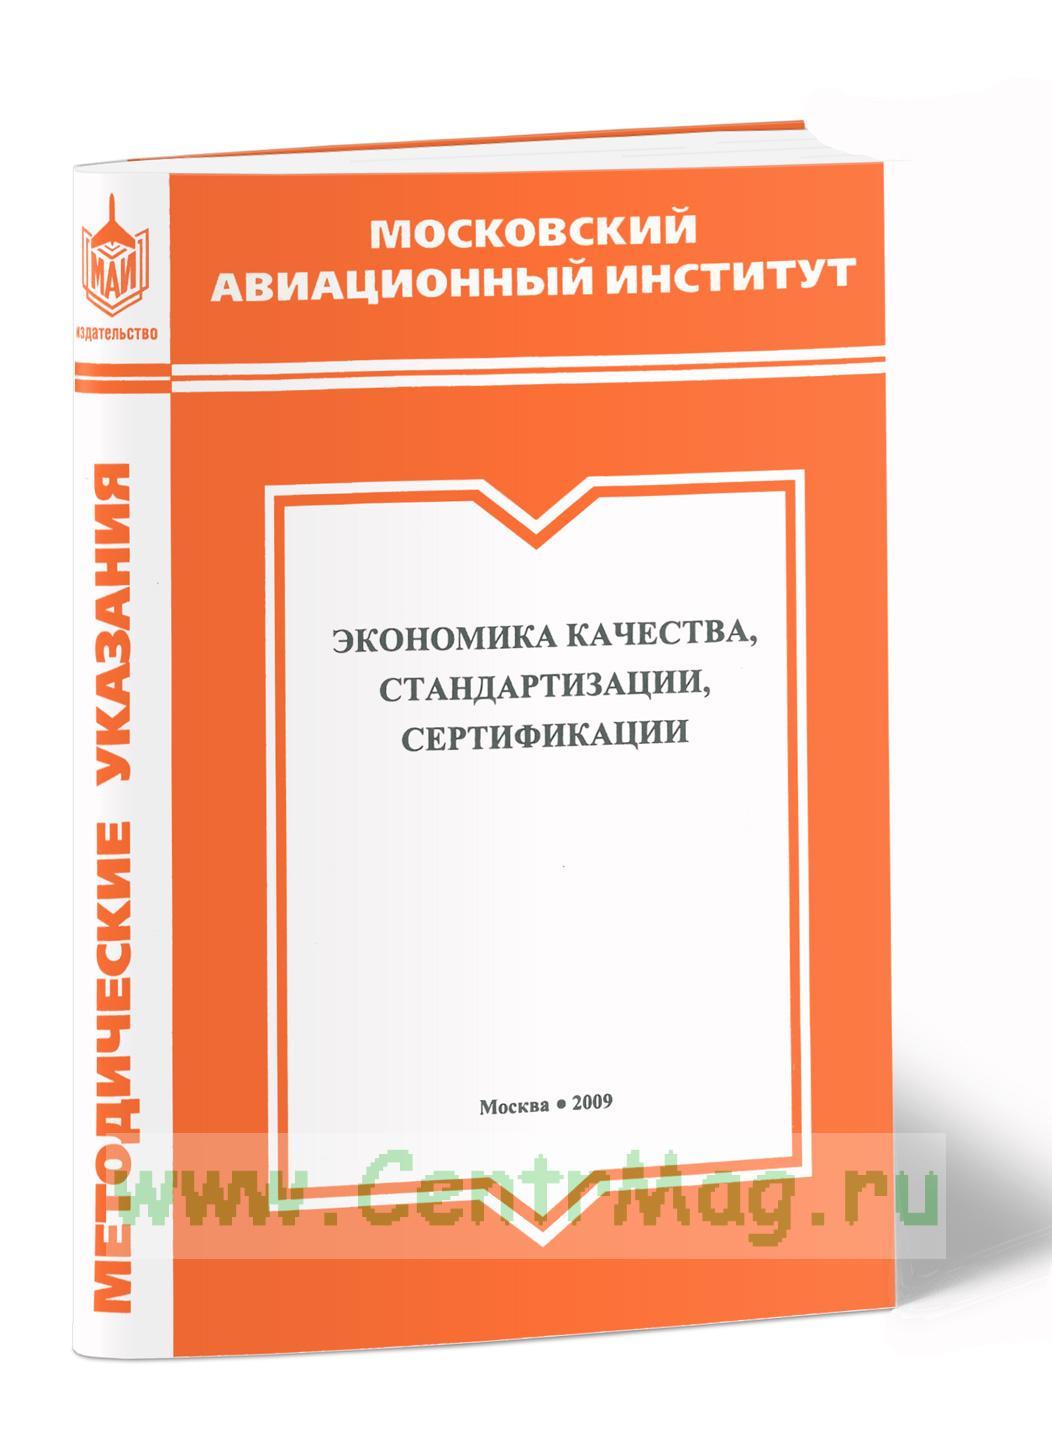 Экономика качества, стандартизации, сертификации